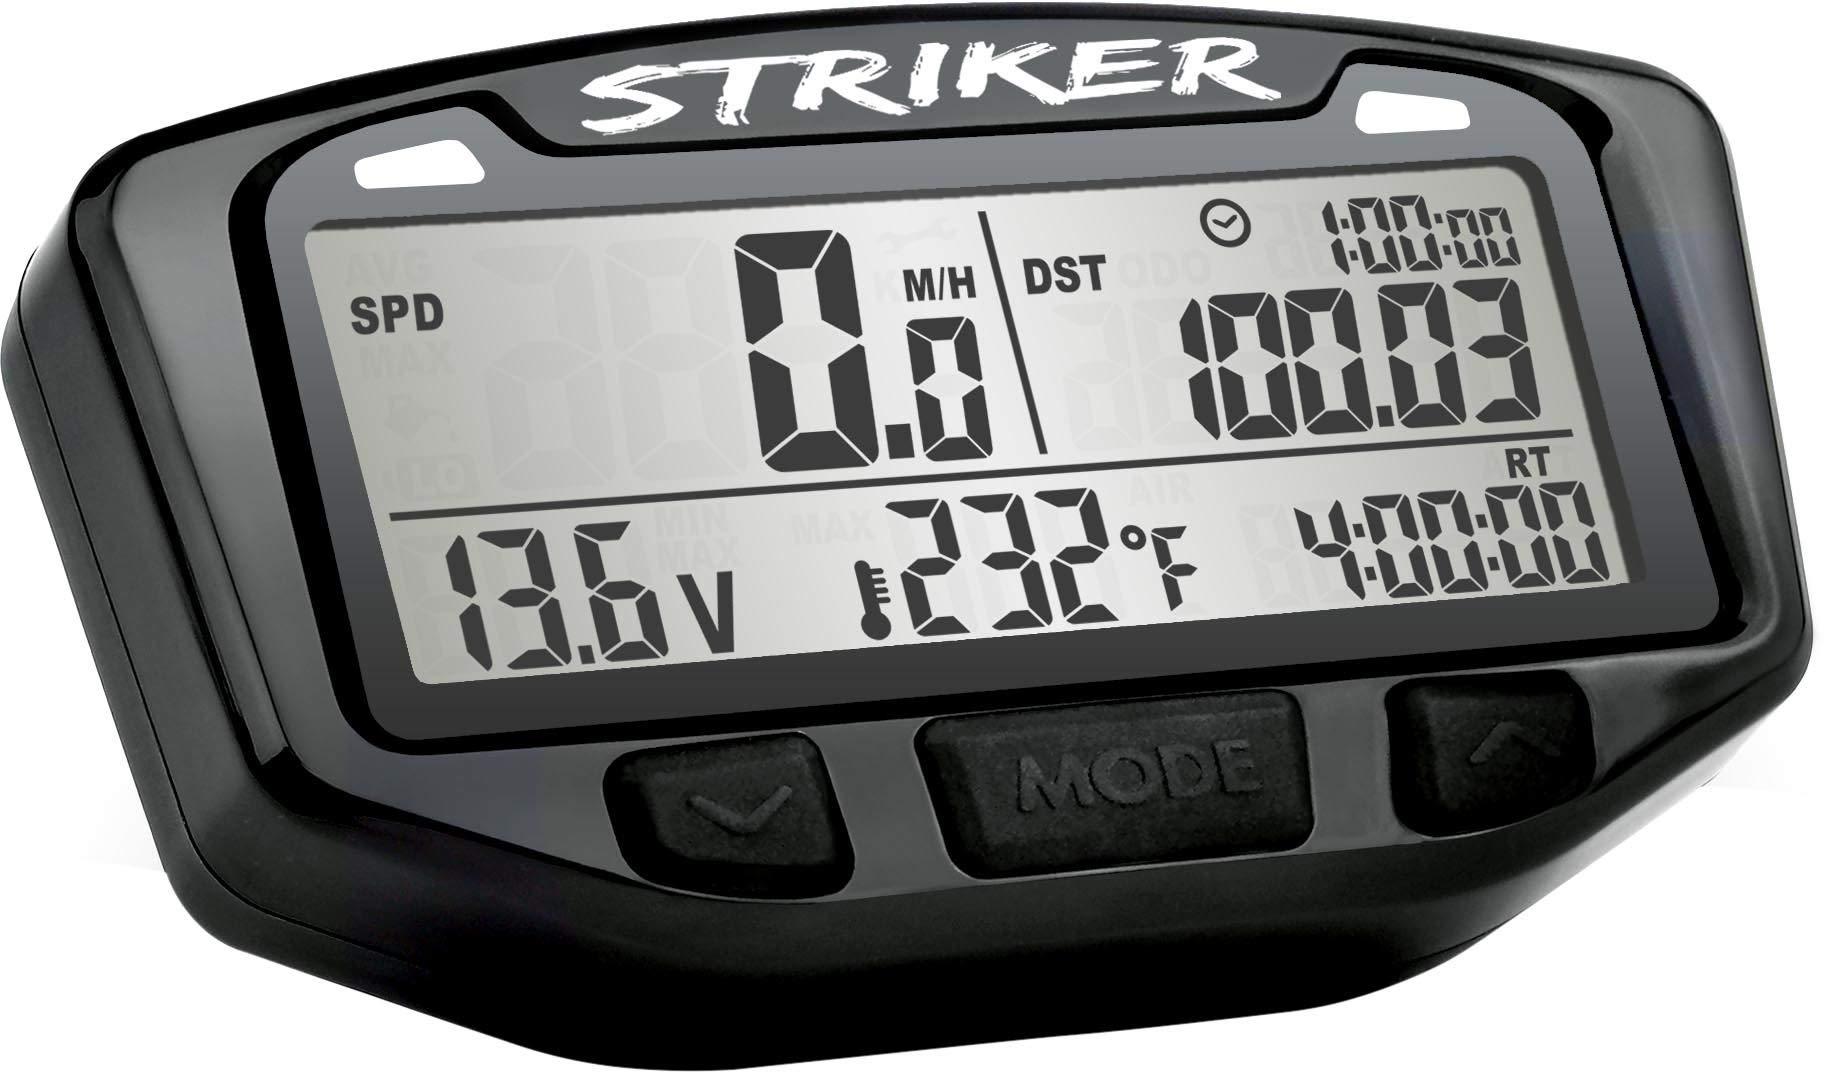 Trail Tech 712-117 Black Striker Speedometer Digital Gauge Kit with Volt Meter by Trail Tech